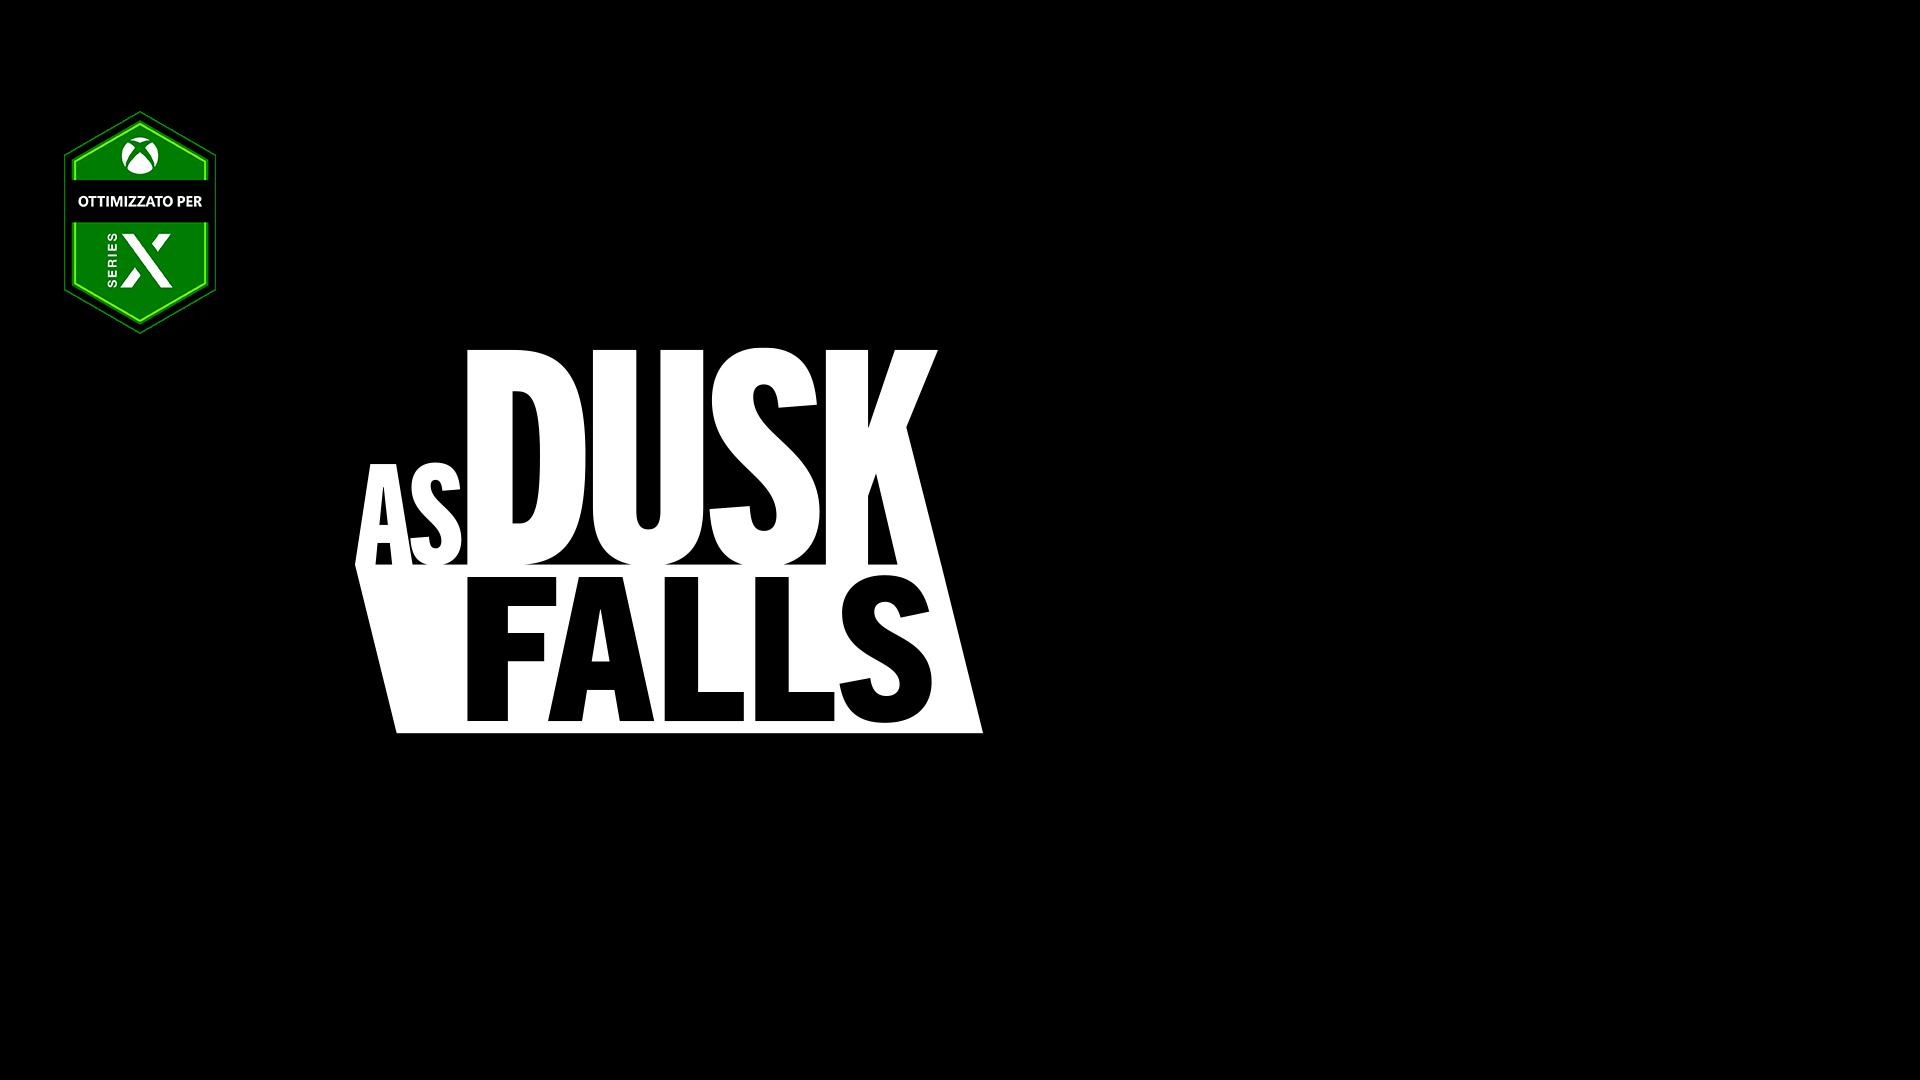 Logo Ottimizzato per Series X, As Dusk Falls